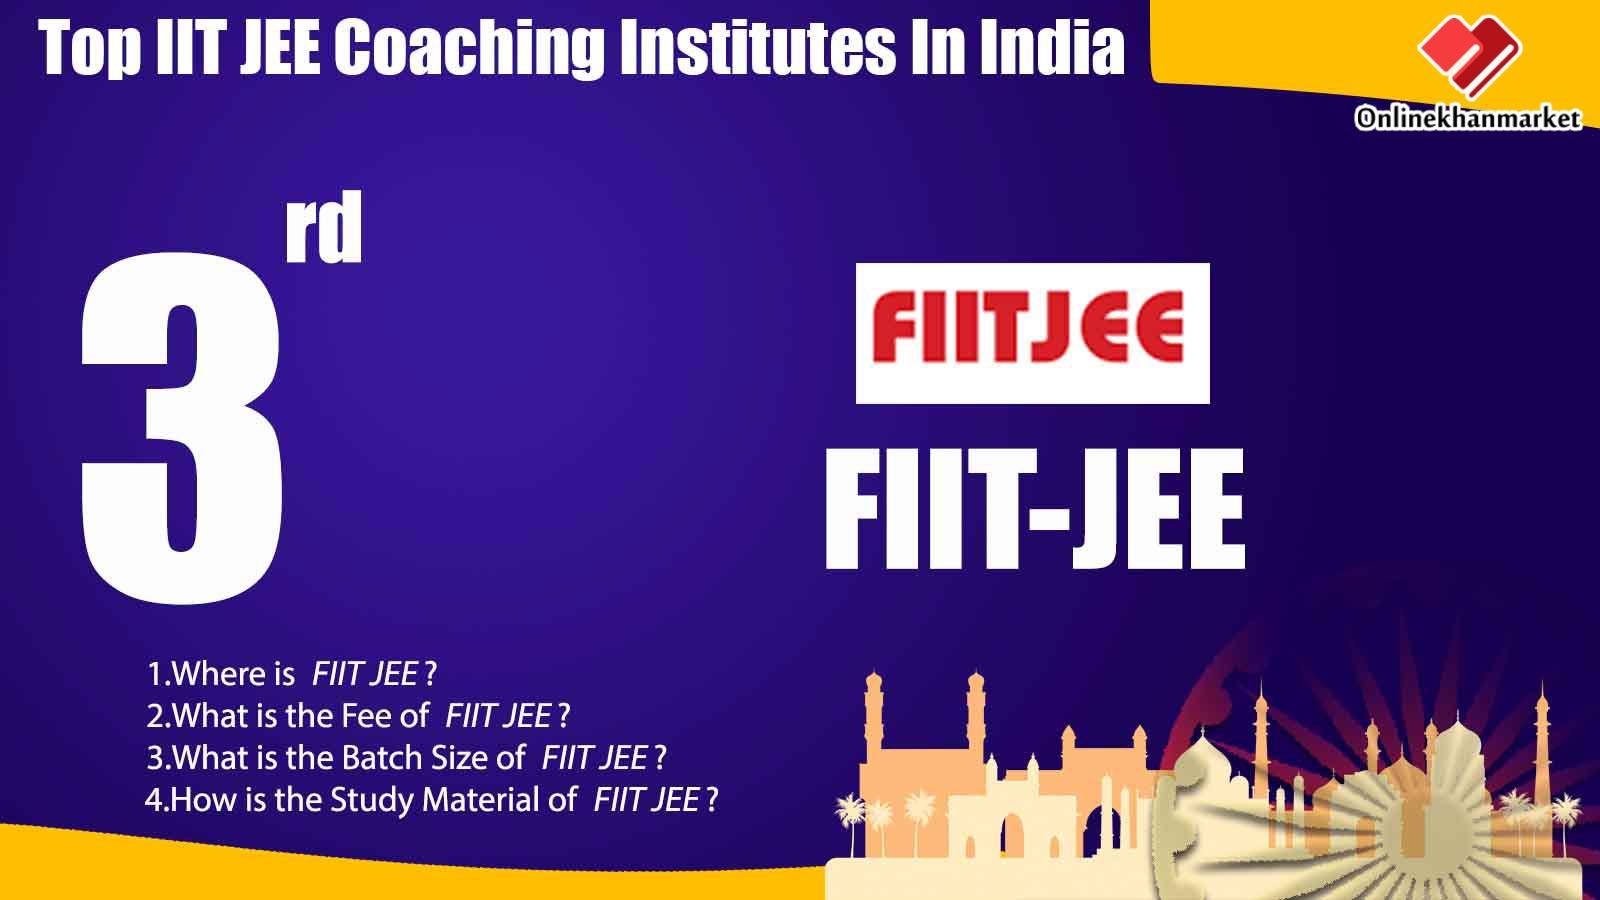 Beet IIT Jee Coaching in India